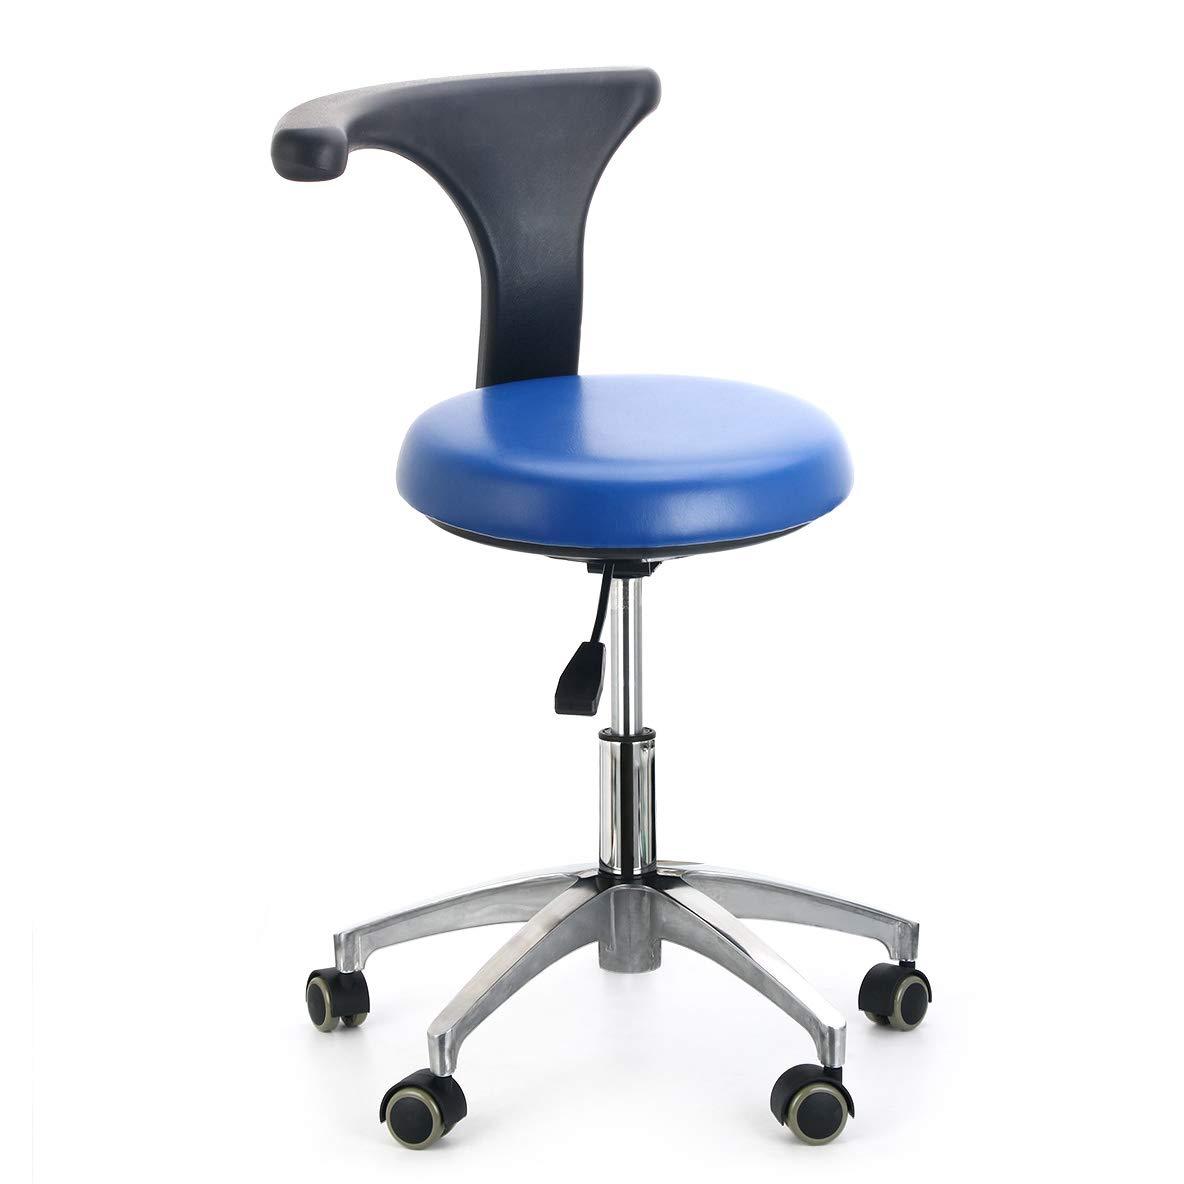 AZDENT Ergonomic Medical Doctor Stool Dentist Swivel Rolling Chair with Back Foot Rest Adjustable Dentist Stool Dental Clinic Spa Massage Salon